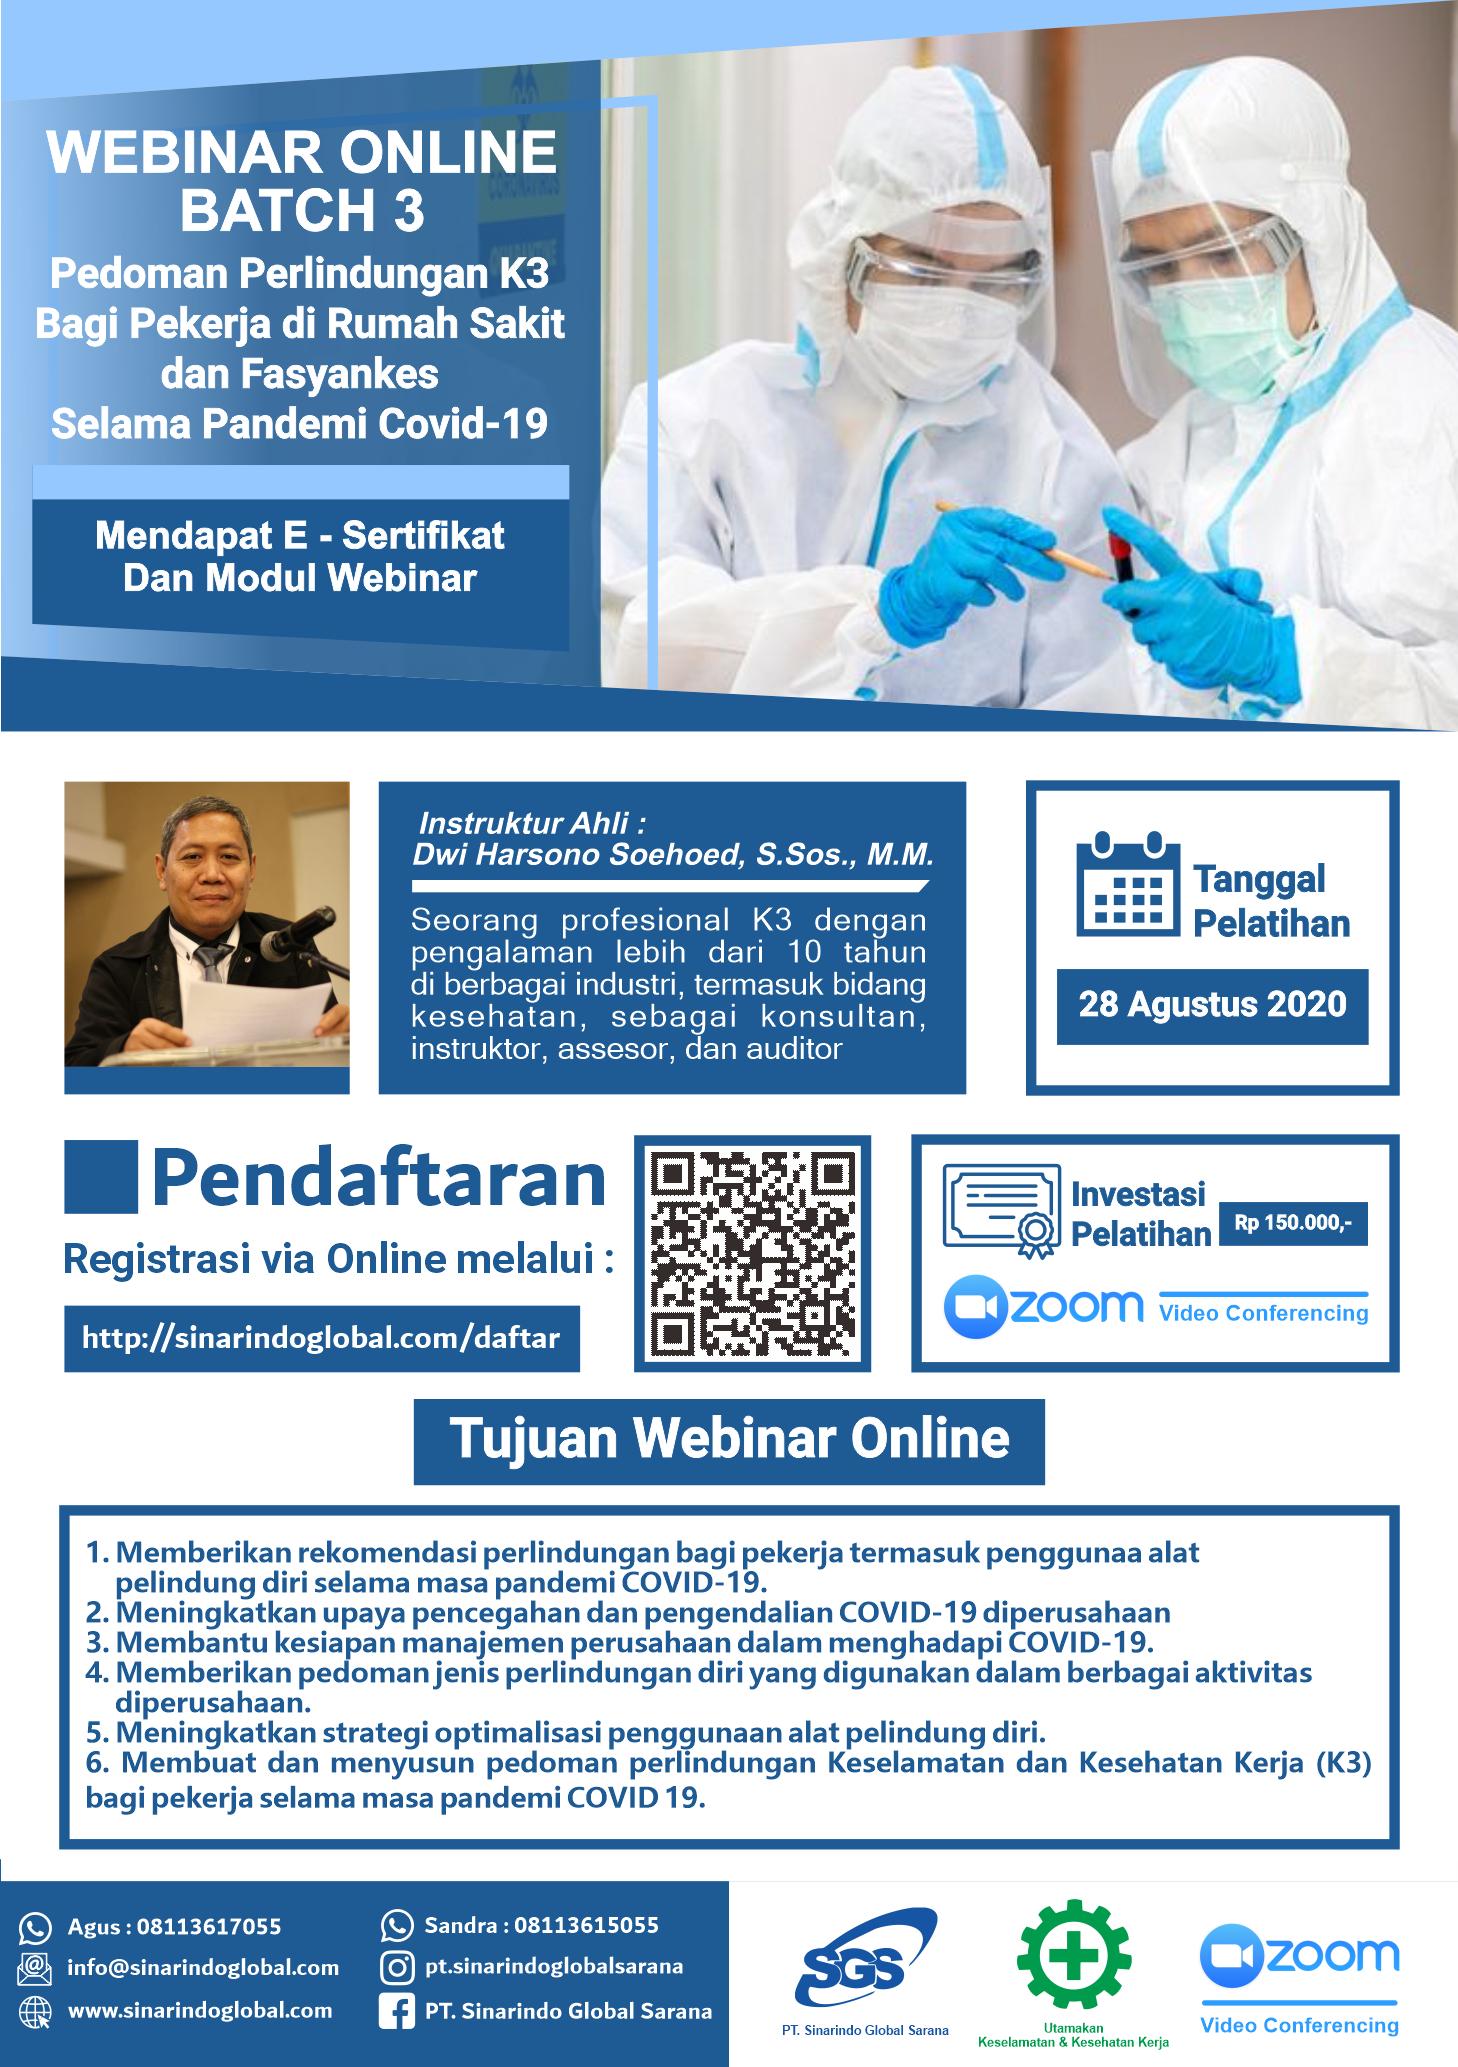 Pedoman Perlindungan K3 bagi Pekerja diRumah Sakit dan Fasyankes Selama Masa Pandemi COVID 19 - 28 Agustus 2020 ( BATCH - 2 )